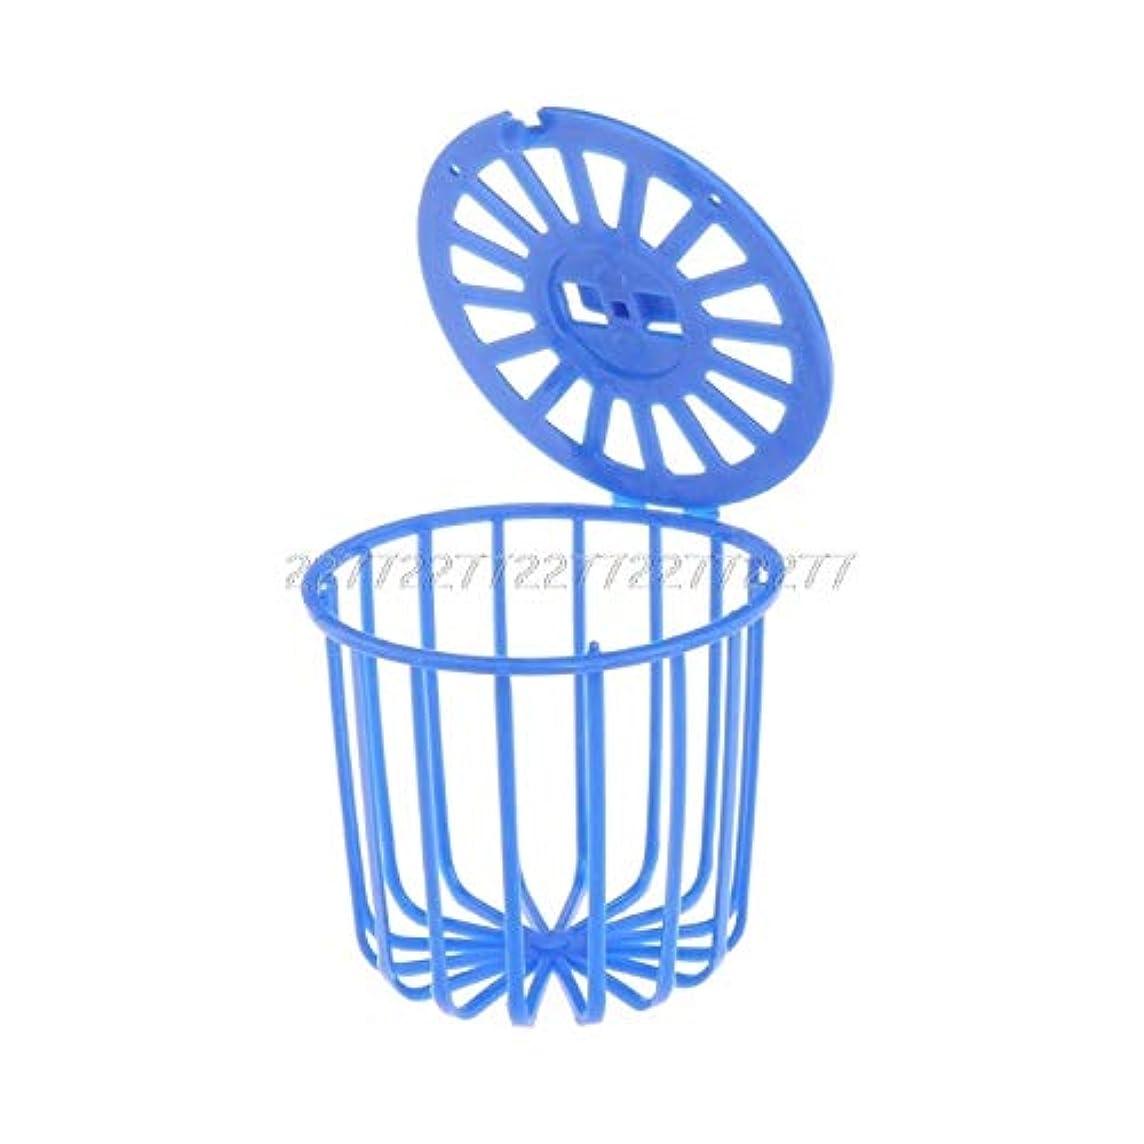 Bird Feeding - Bird Parrot Feeder Cage Fruit Vegetable Holder Hanging Basket Container Pet O23 - Tube Pole Cups Patio Spoon Formula Bird Bath Cameras Post Blocks Dish Needle Feeders Books H